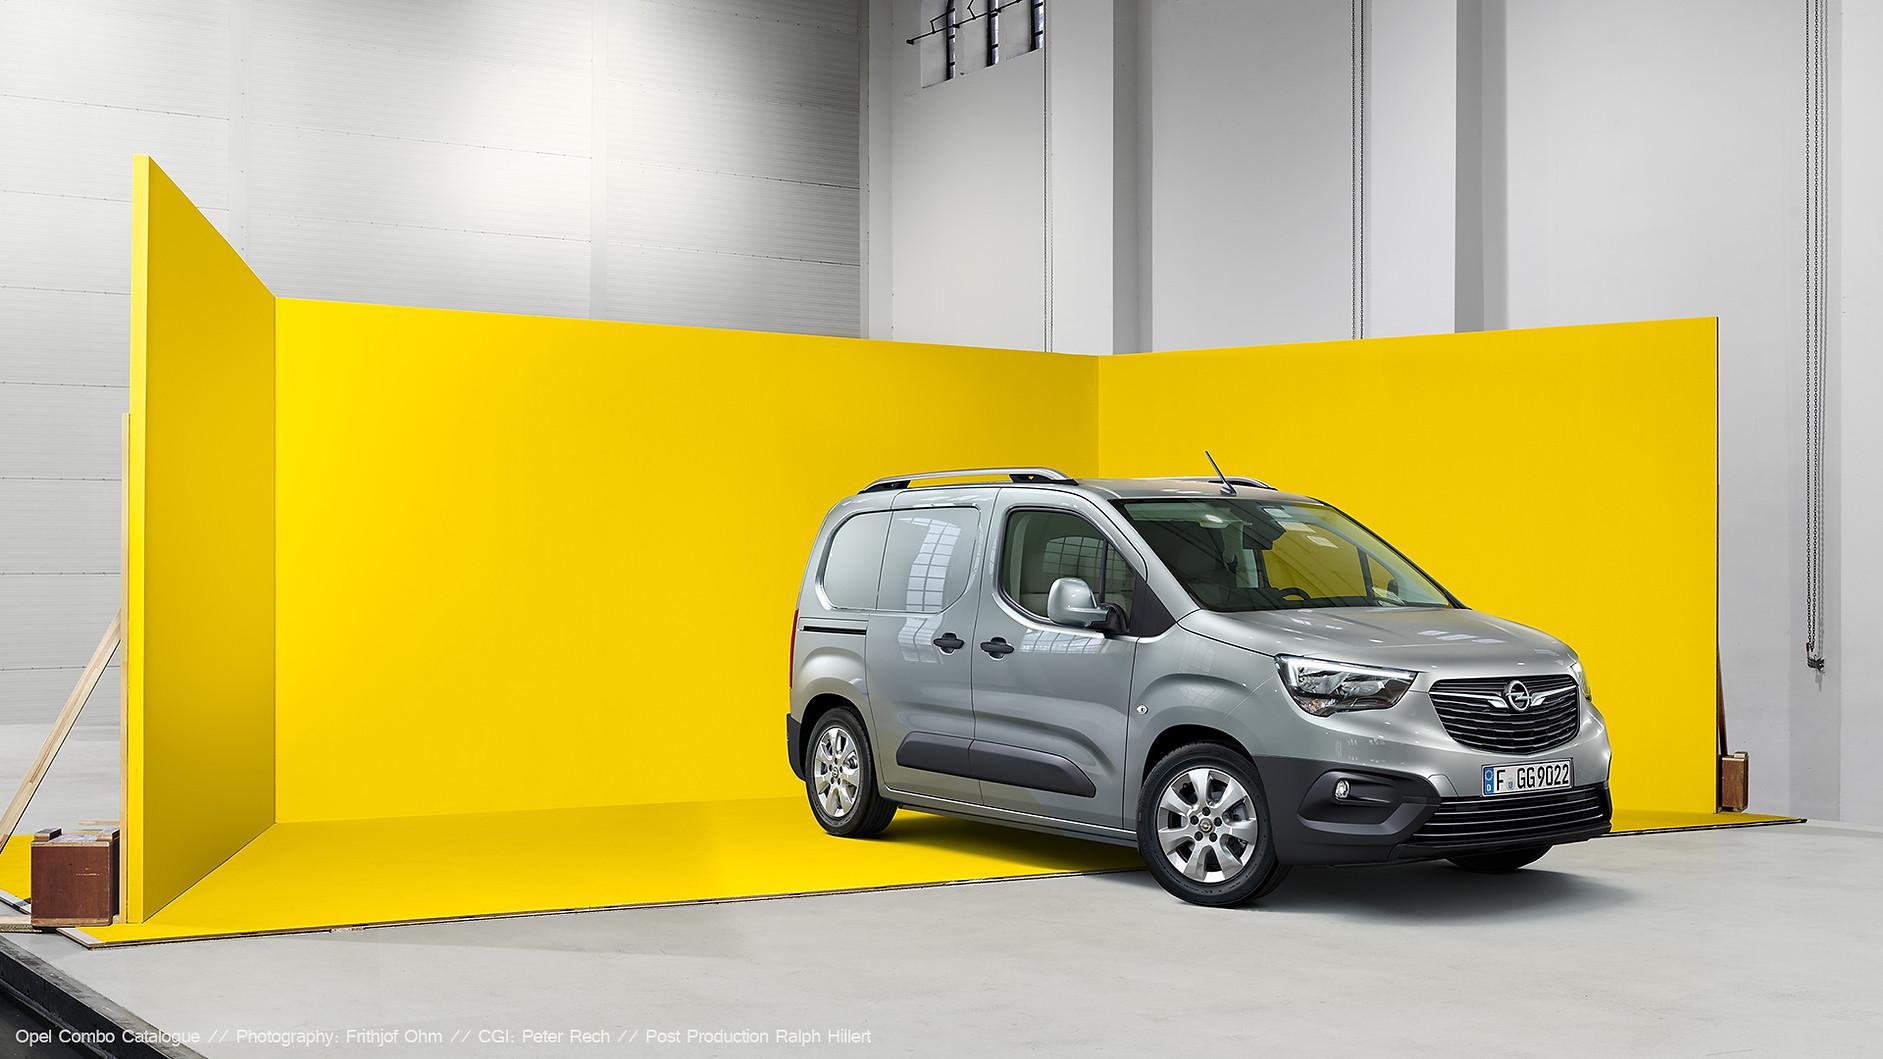 Opel_Combo_Katalog_02.jpg